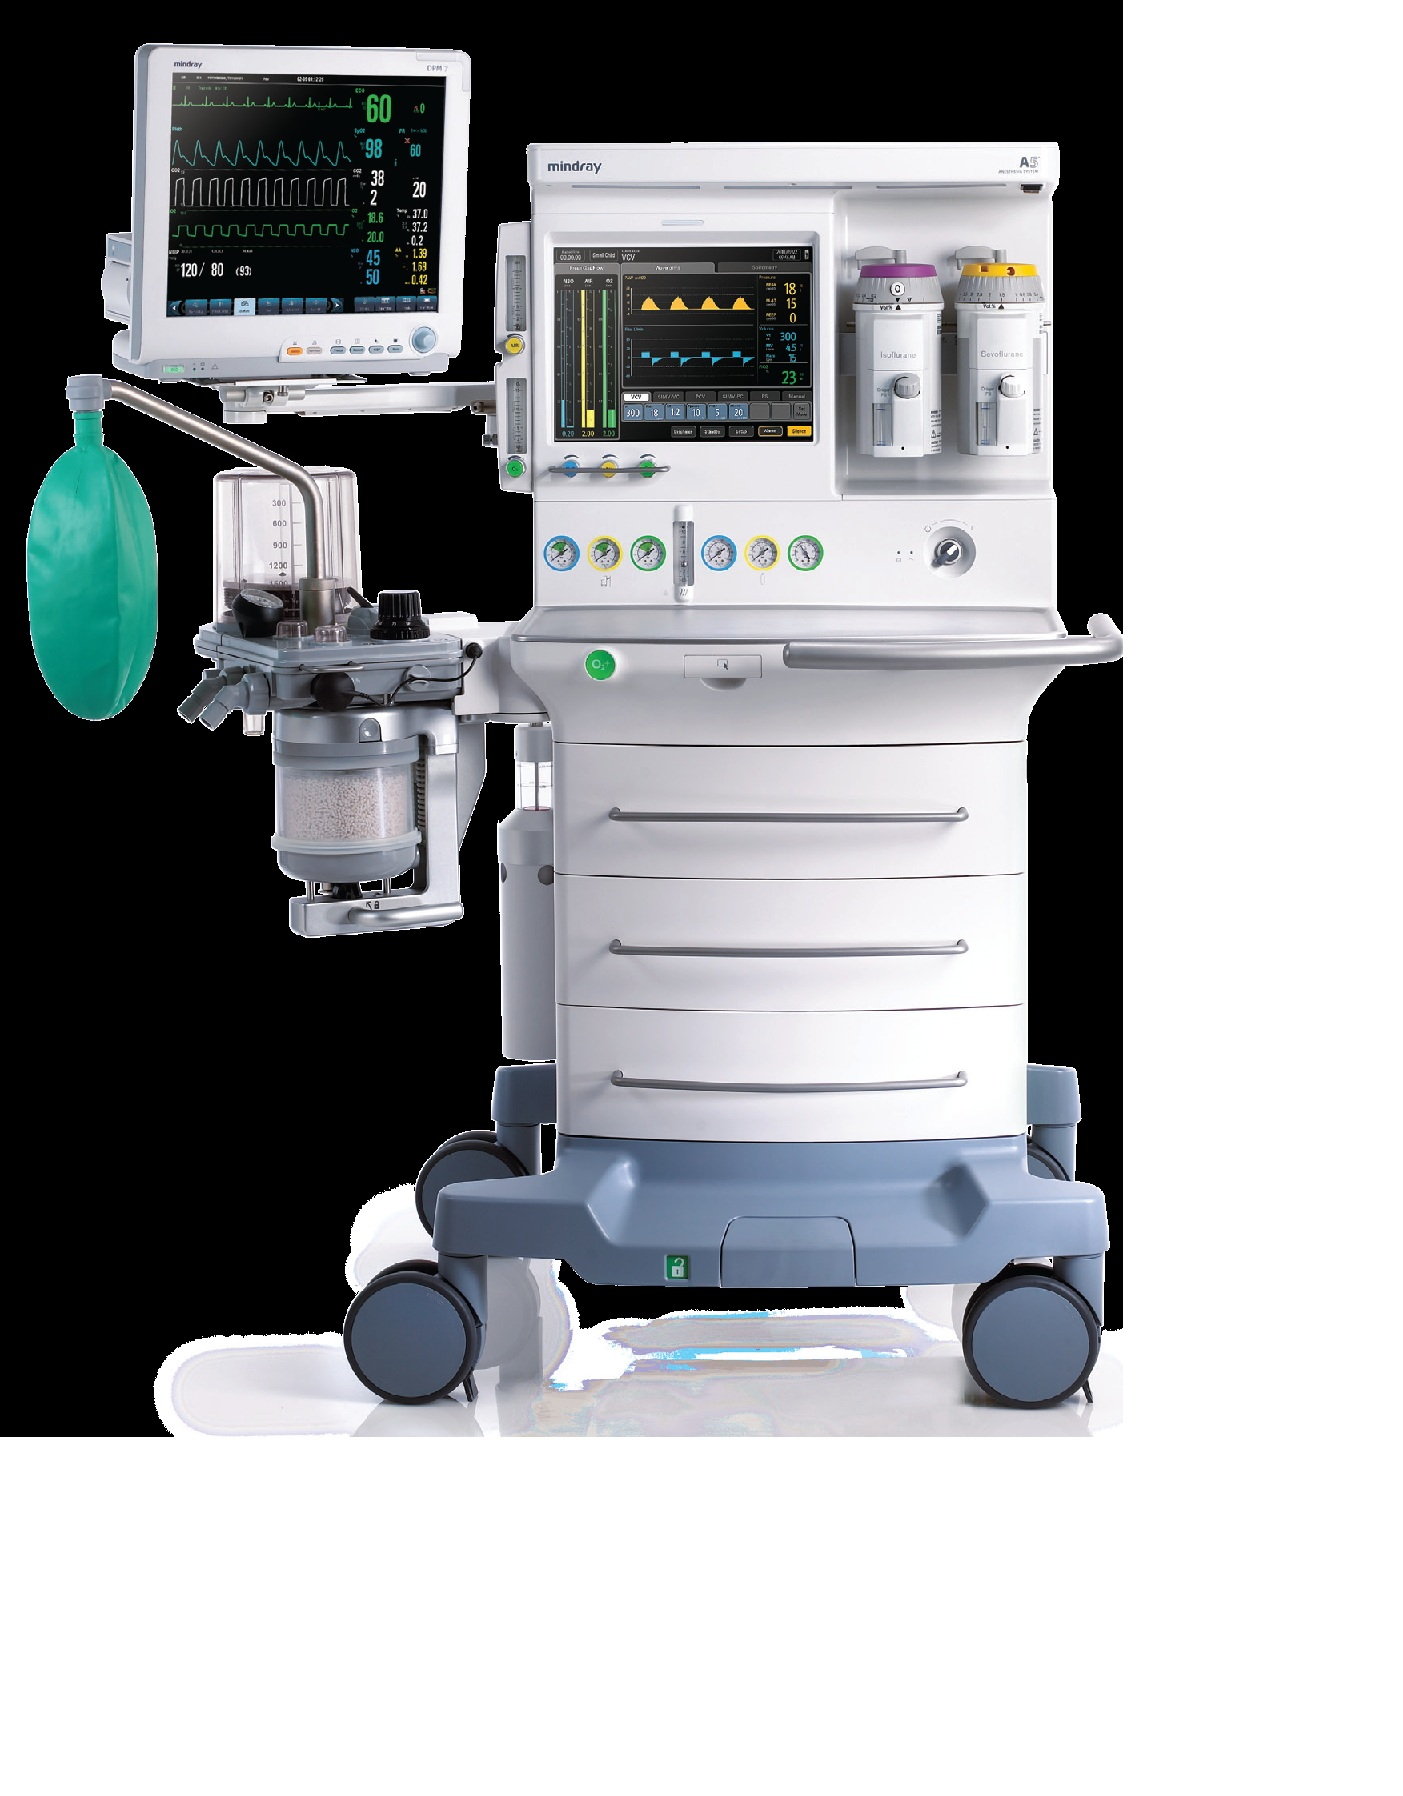 Anesthesia Gas Machine Models Colorsensorcircuit Light Sensor Circuitclick For Next Circuit Mindray A5